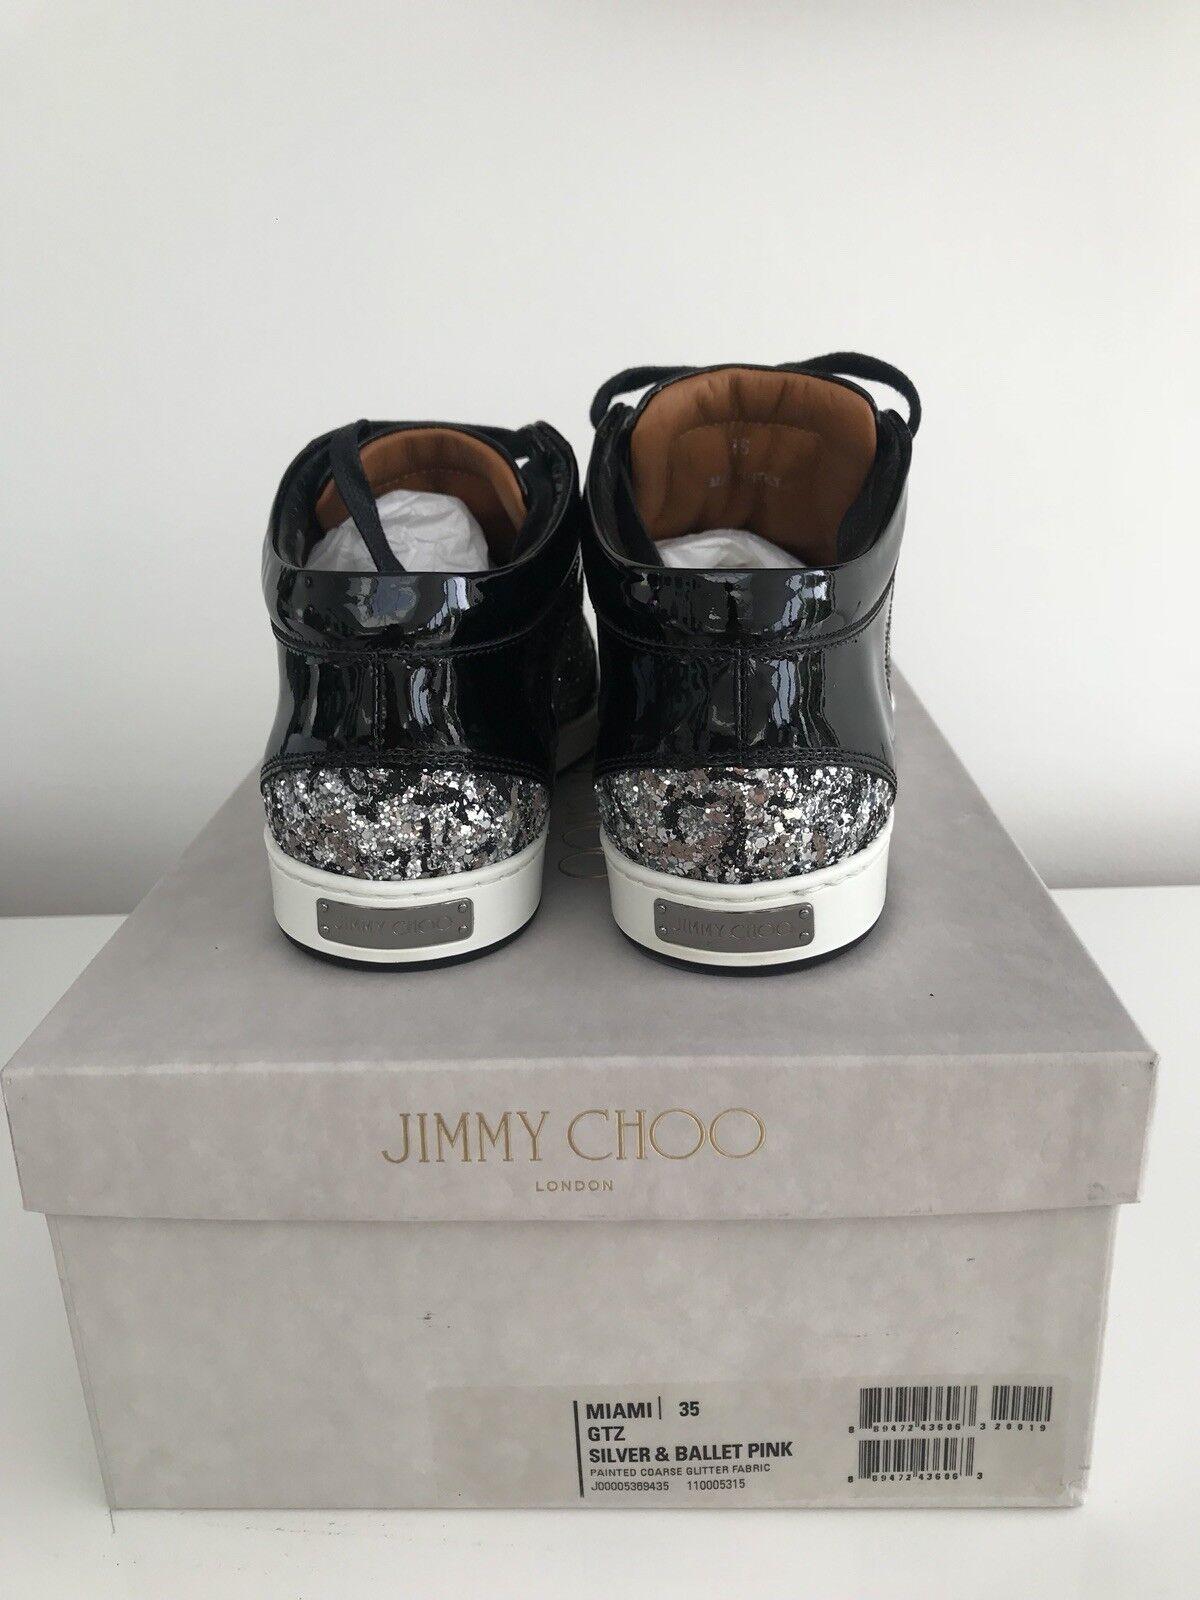 Jimmy Choo Miami Miami Miami Baskets 5816c7